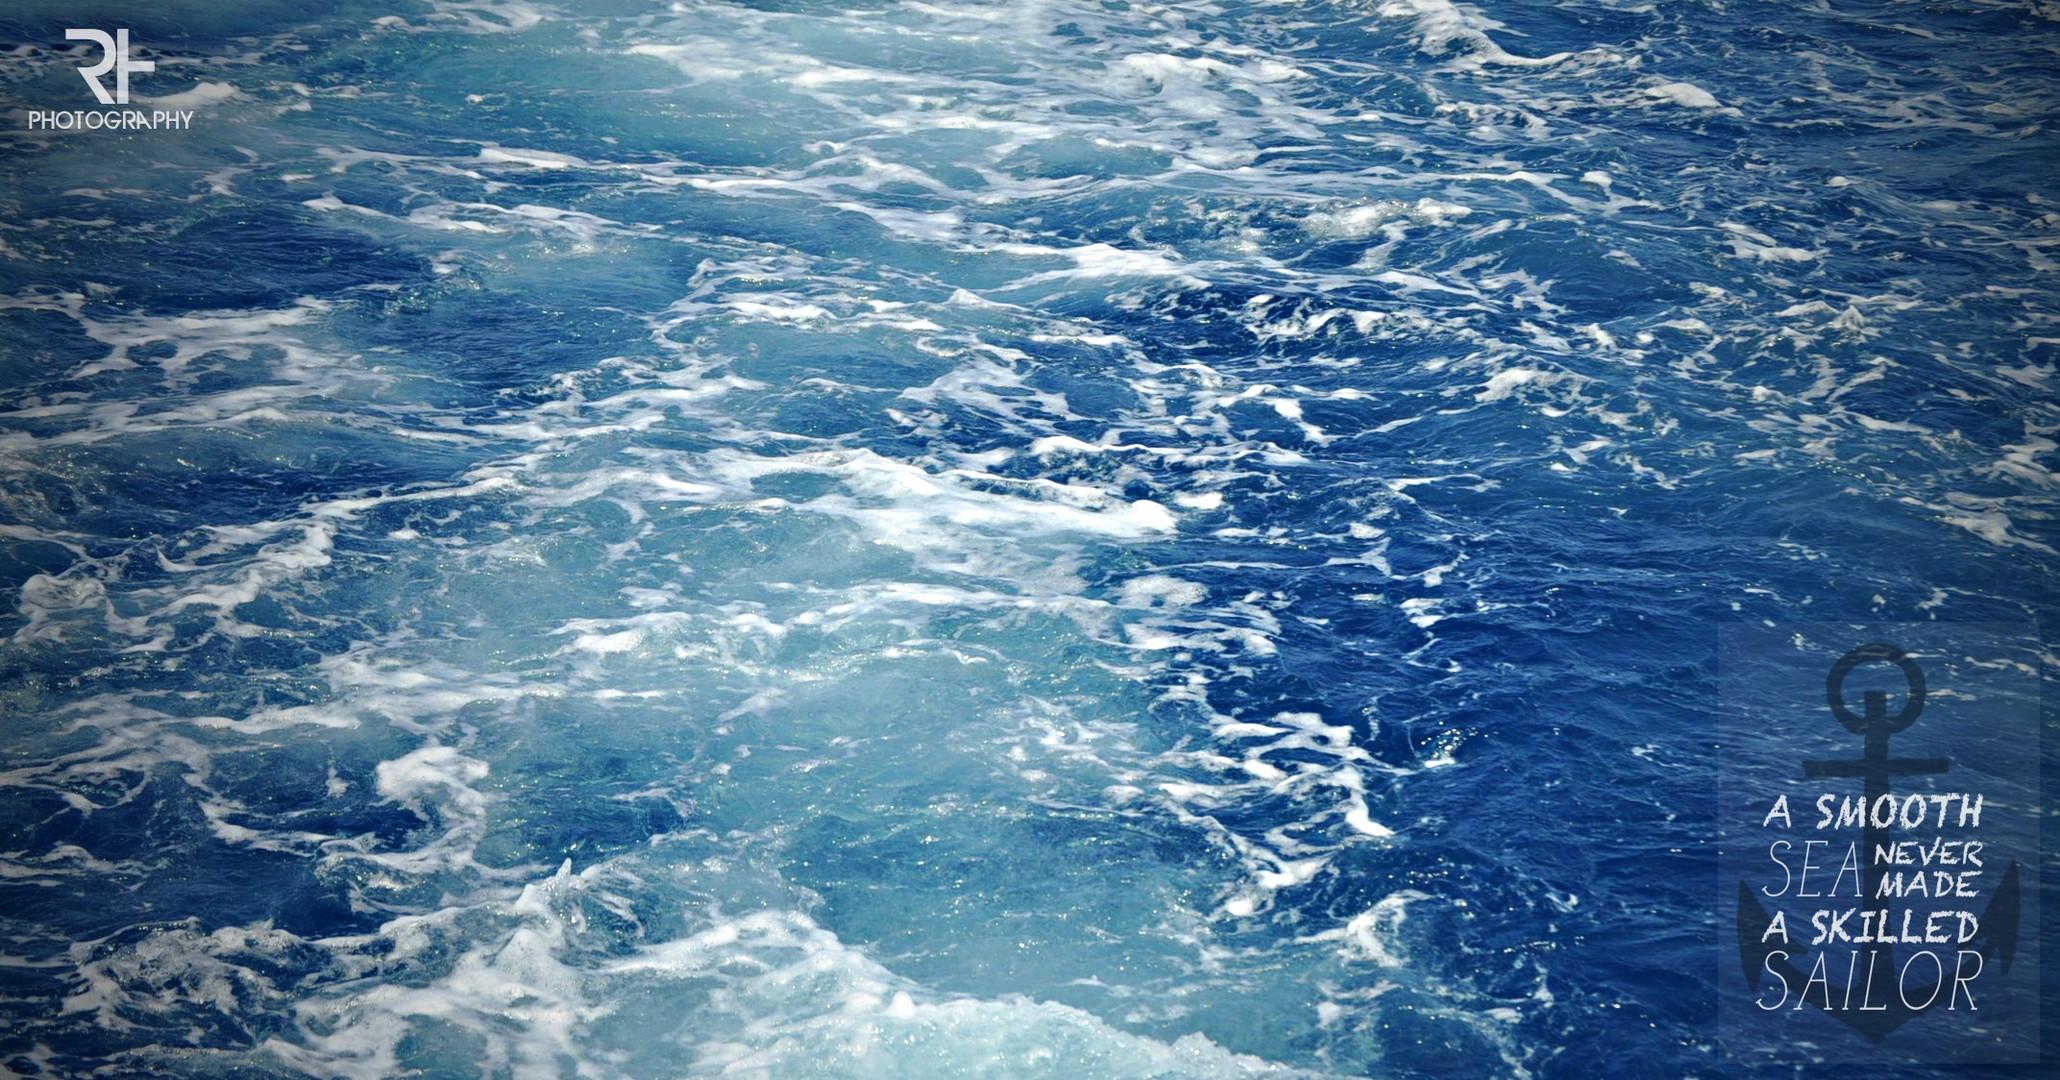 a smooth sea never made a skilled sailor !